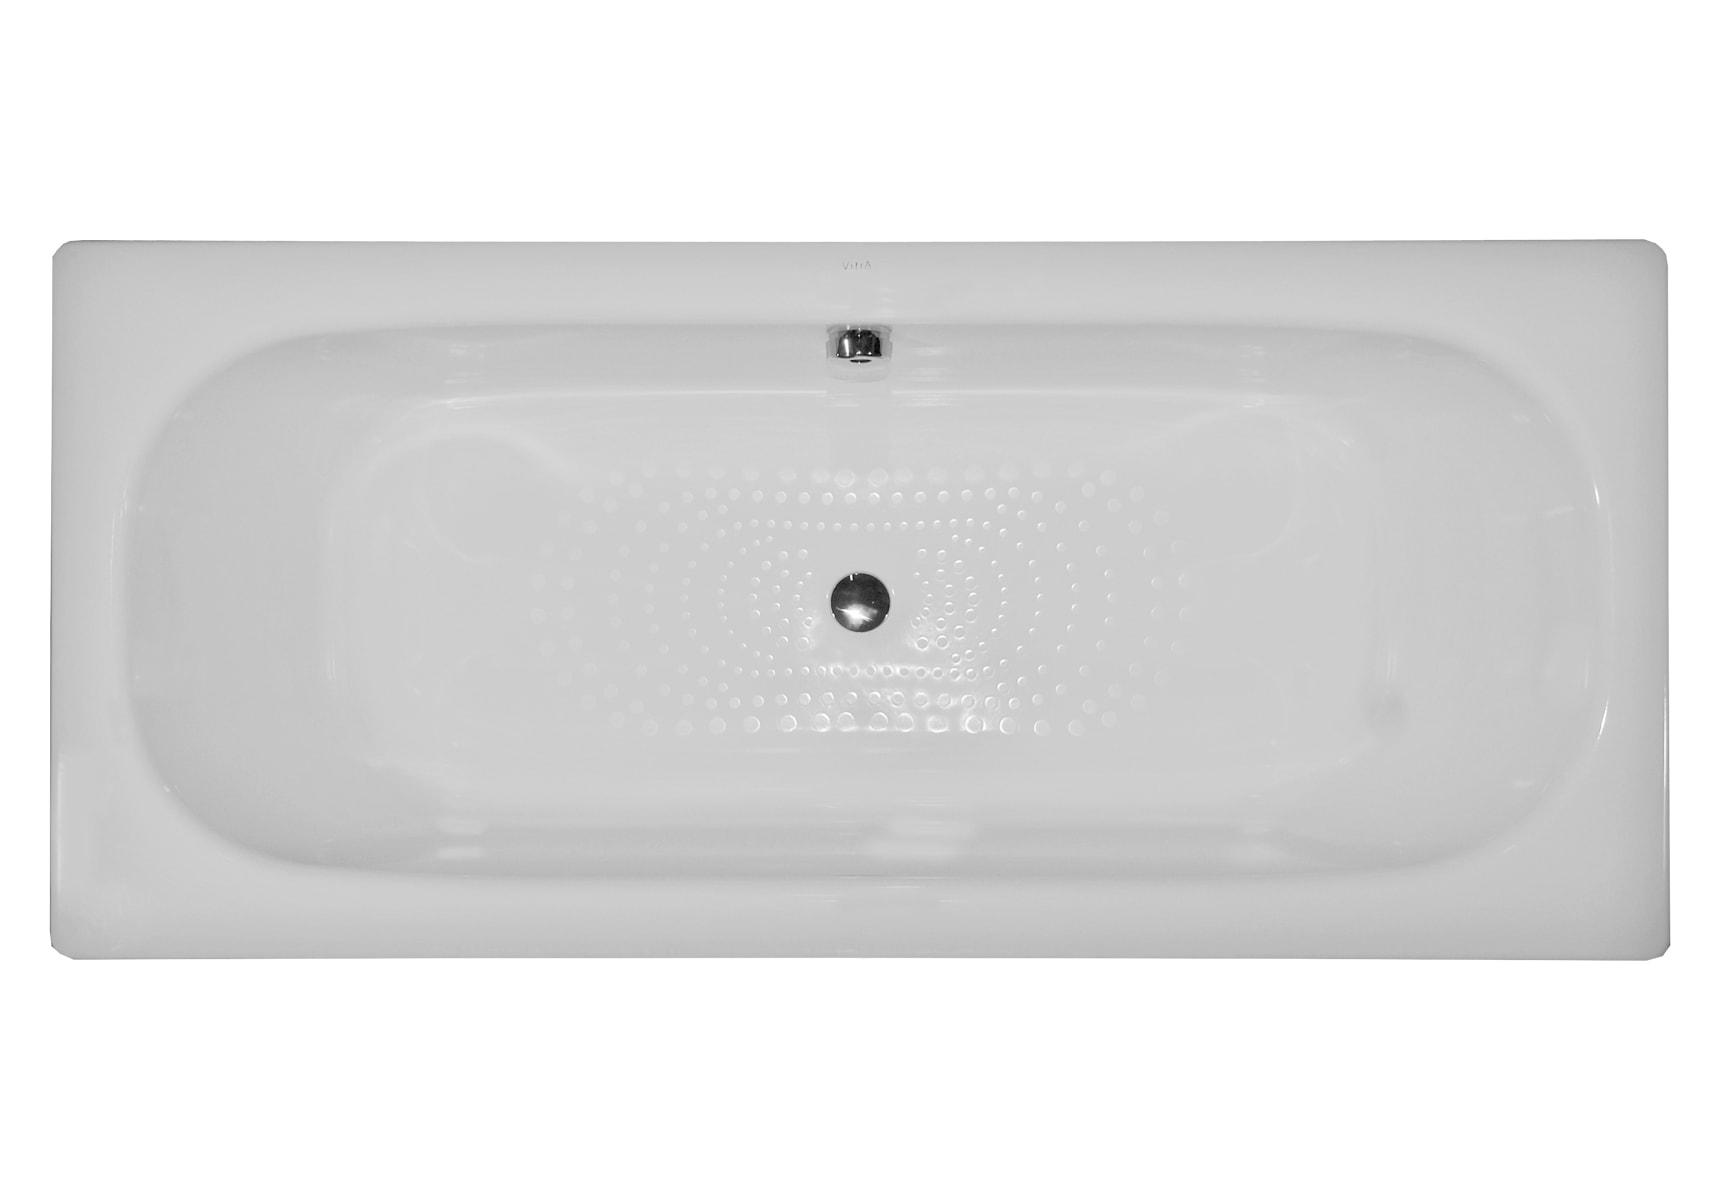 Generic Duo 170x75cm Steel Bathtub, 3.5mm, Sound Proofing Pad